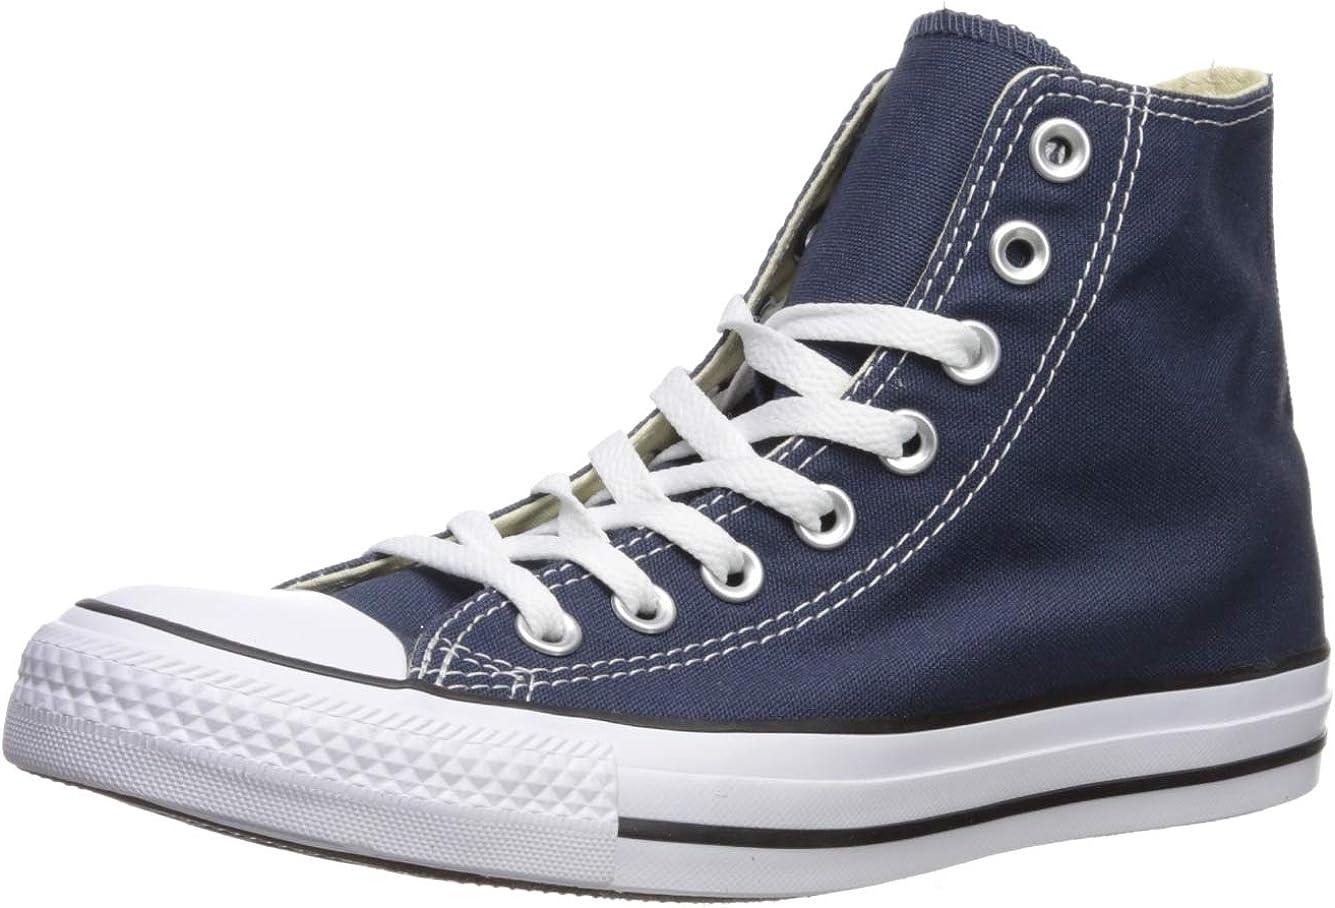 B00008KZEA Converse Chuck Taylor All Star High Top Sneaker 61YwIkpeZNL